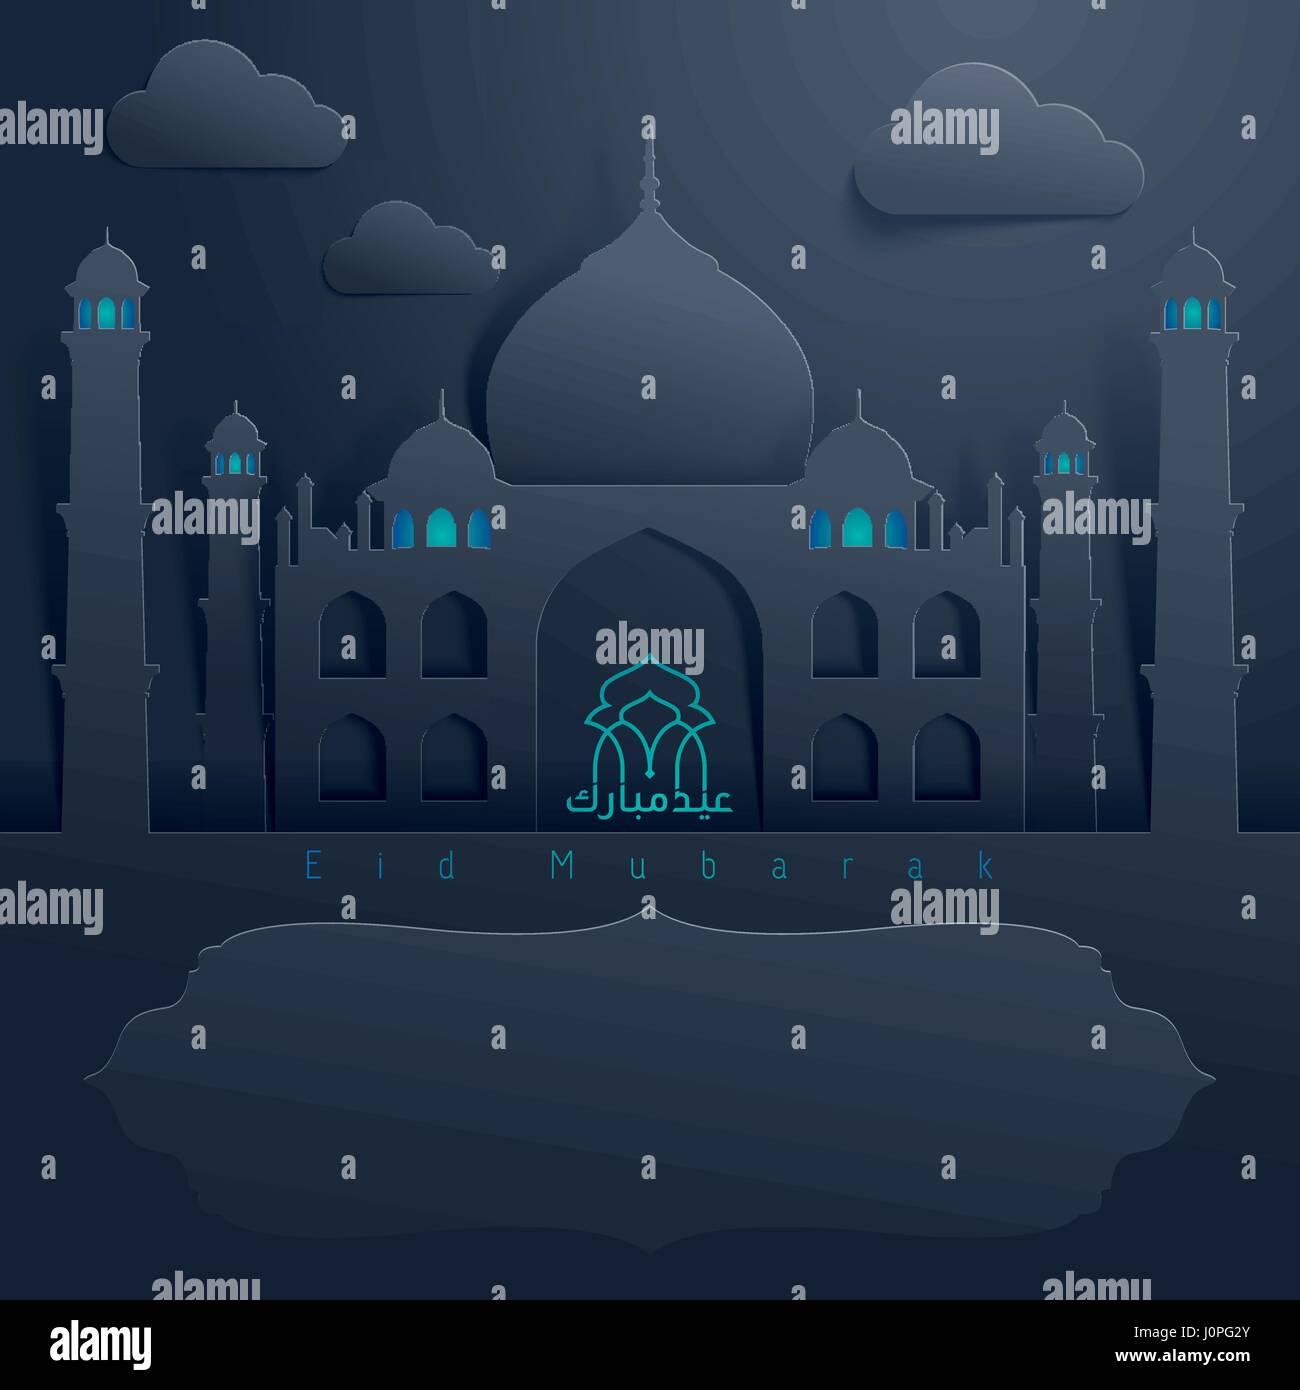 Mosque background for ramadan kareem stock photography image - Islamic Background Mosque And Camel Arabian Travel For Ramadan Kareem